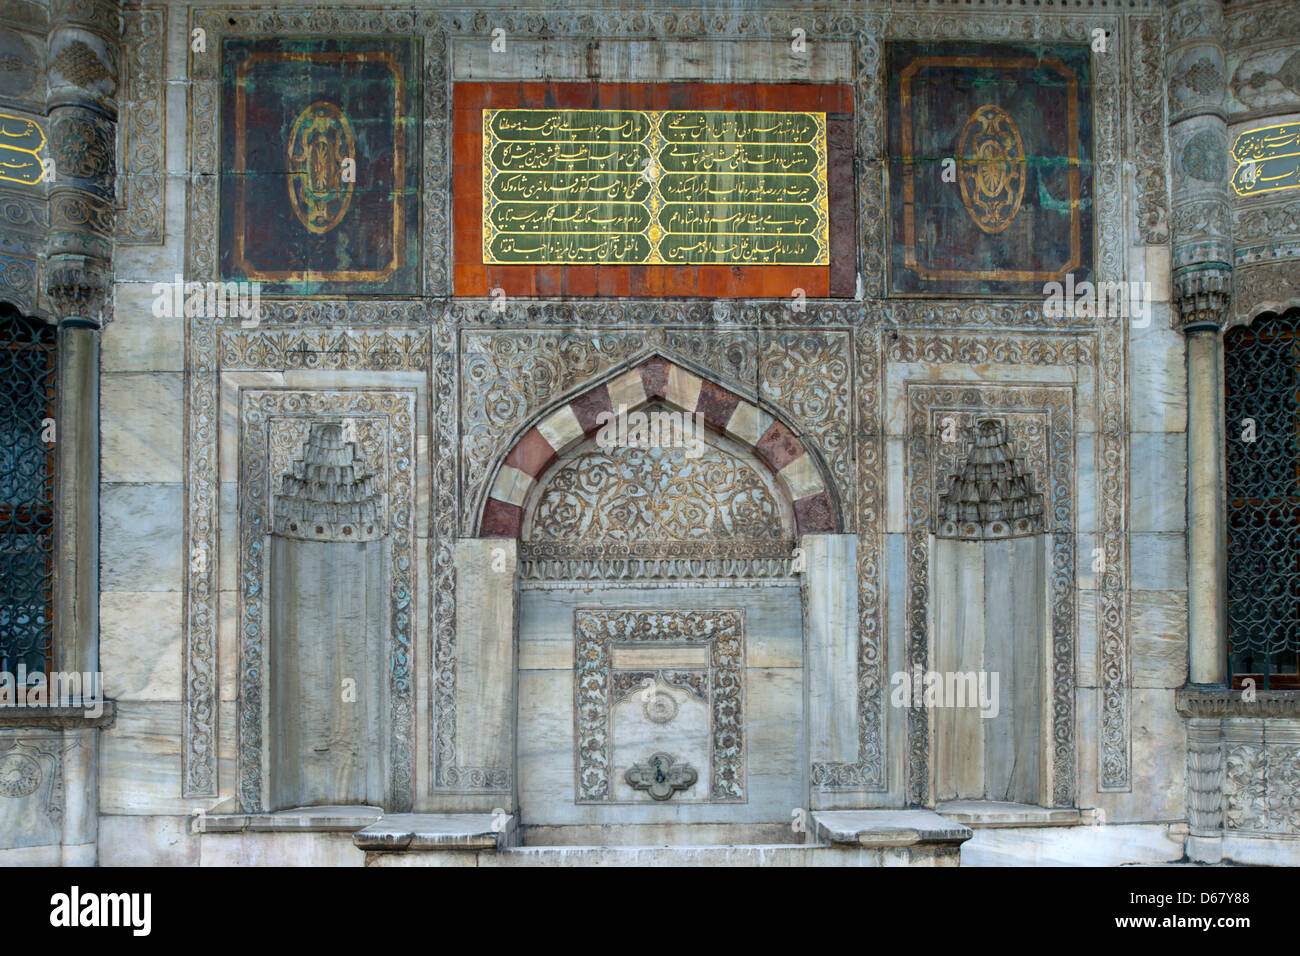 Türkei, Istanbul, Sultanahmet Sultan Ahmet III Brunnen vor dem Topkapi Palast, Nordost-Seite Foto Stock